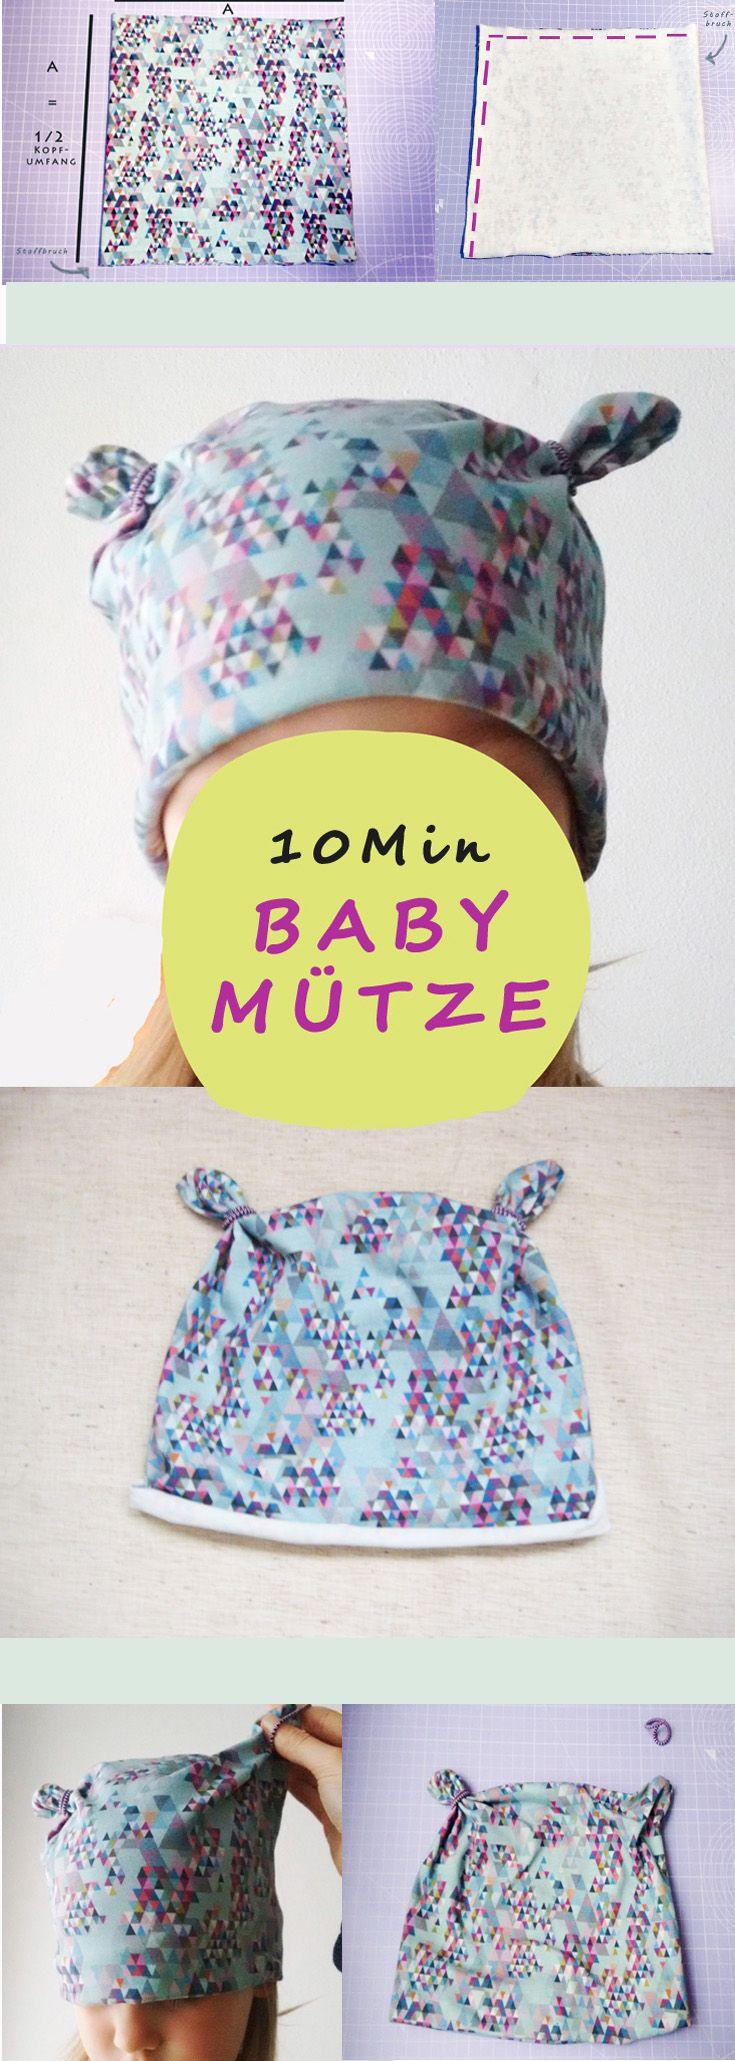 Babymütze nähen – Anleitung mit einfachem Schnittmuster – Jenny Voho